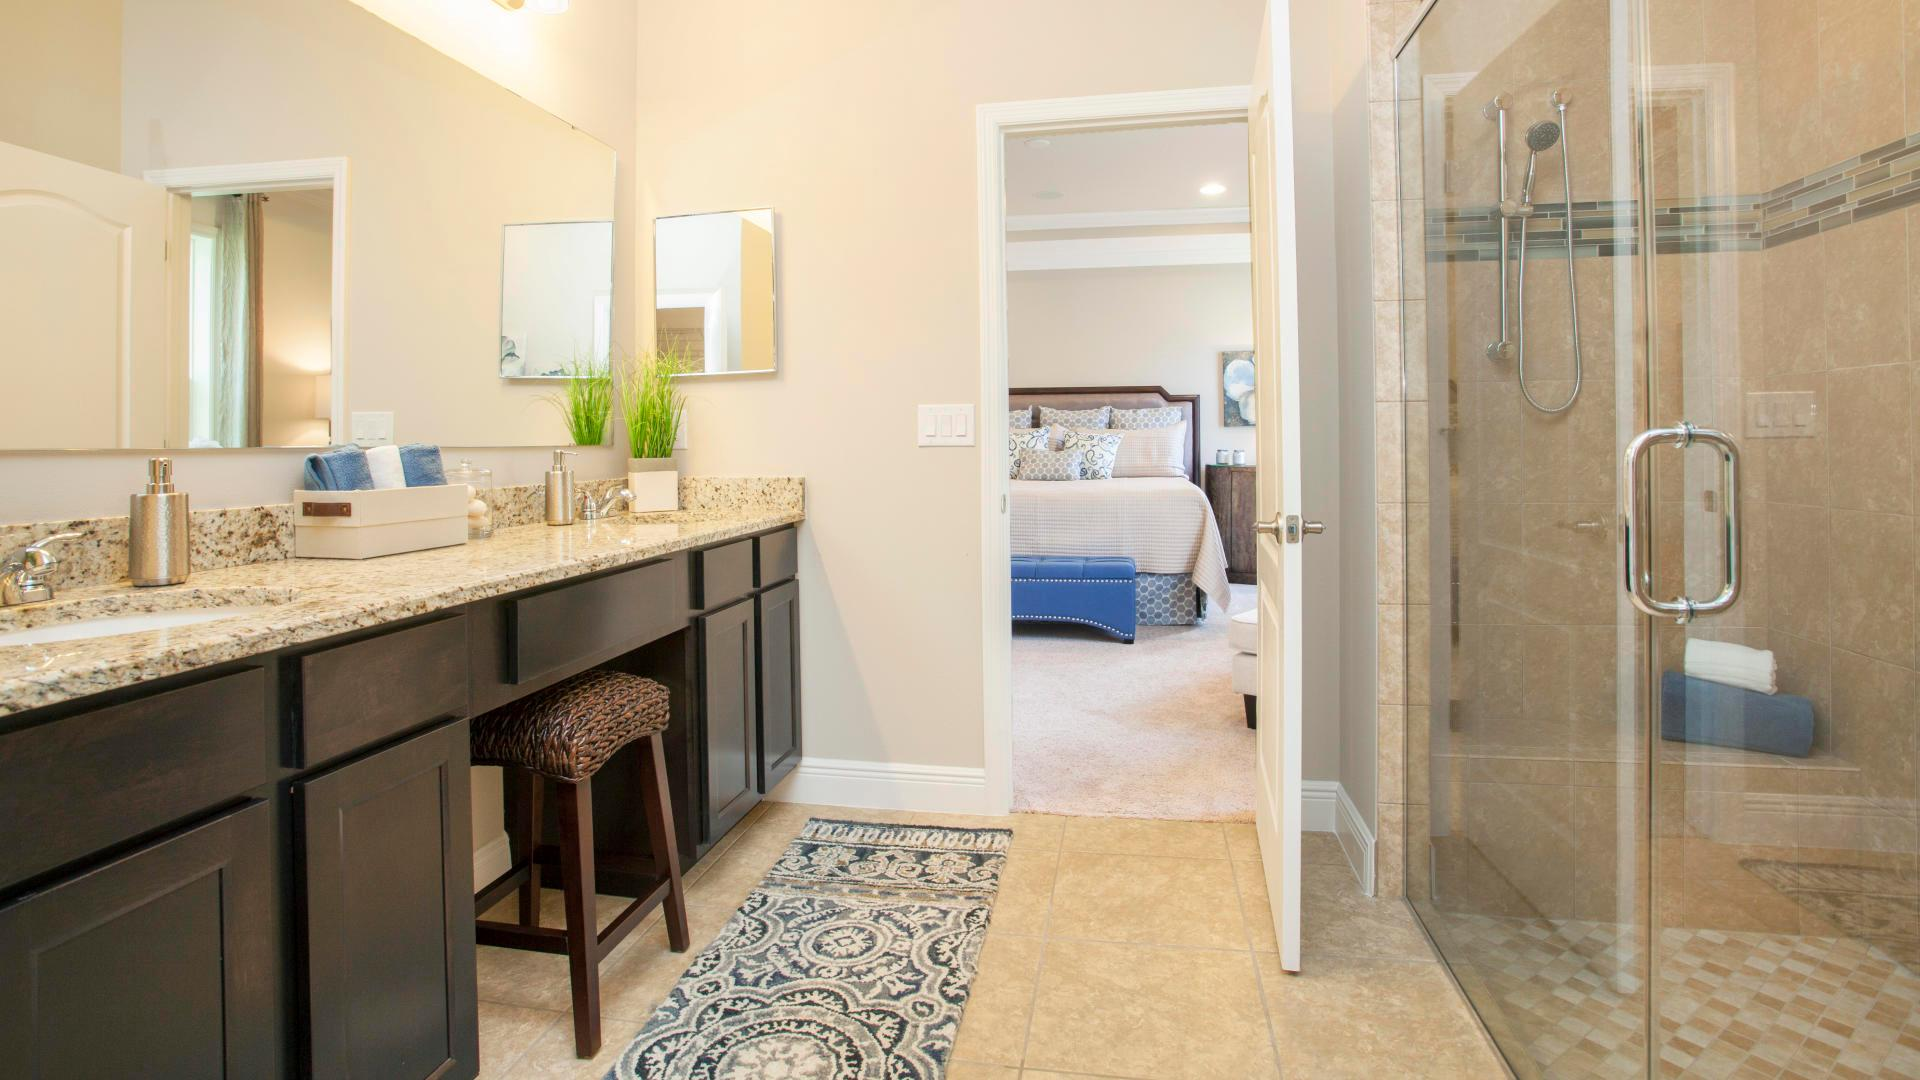 Bathroom featured in the Melody By Maronda Homes in Daytona Beach, FL